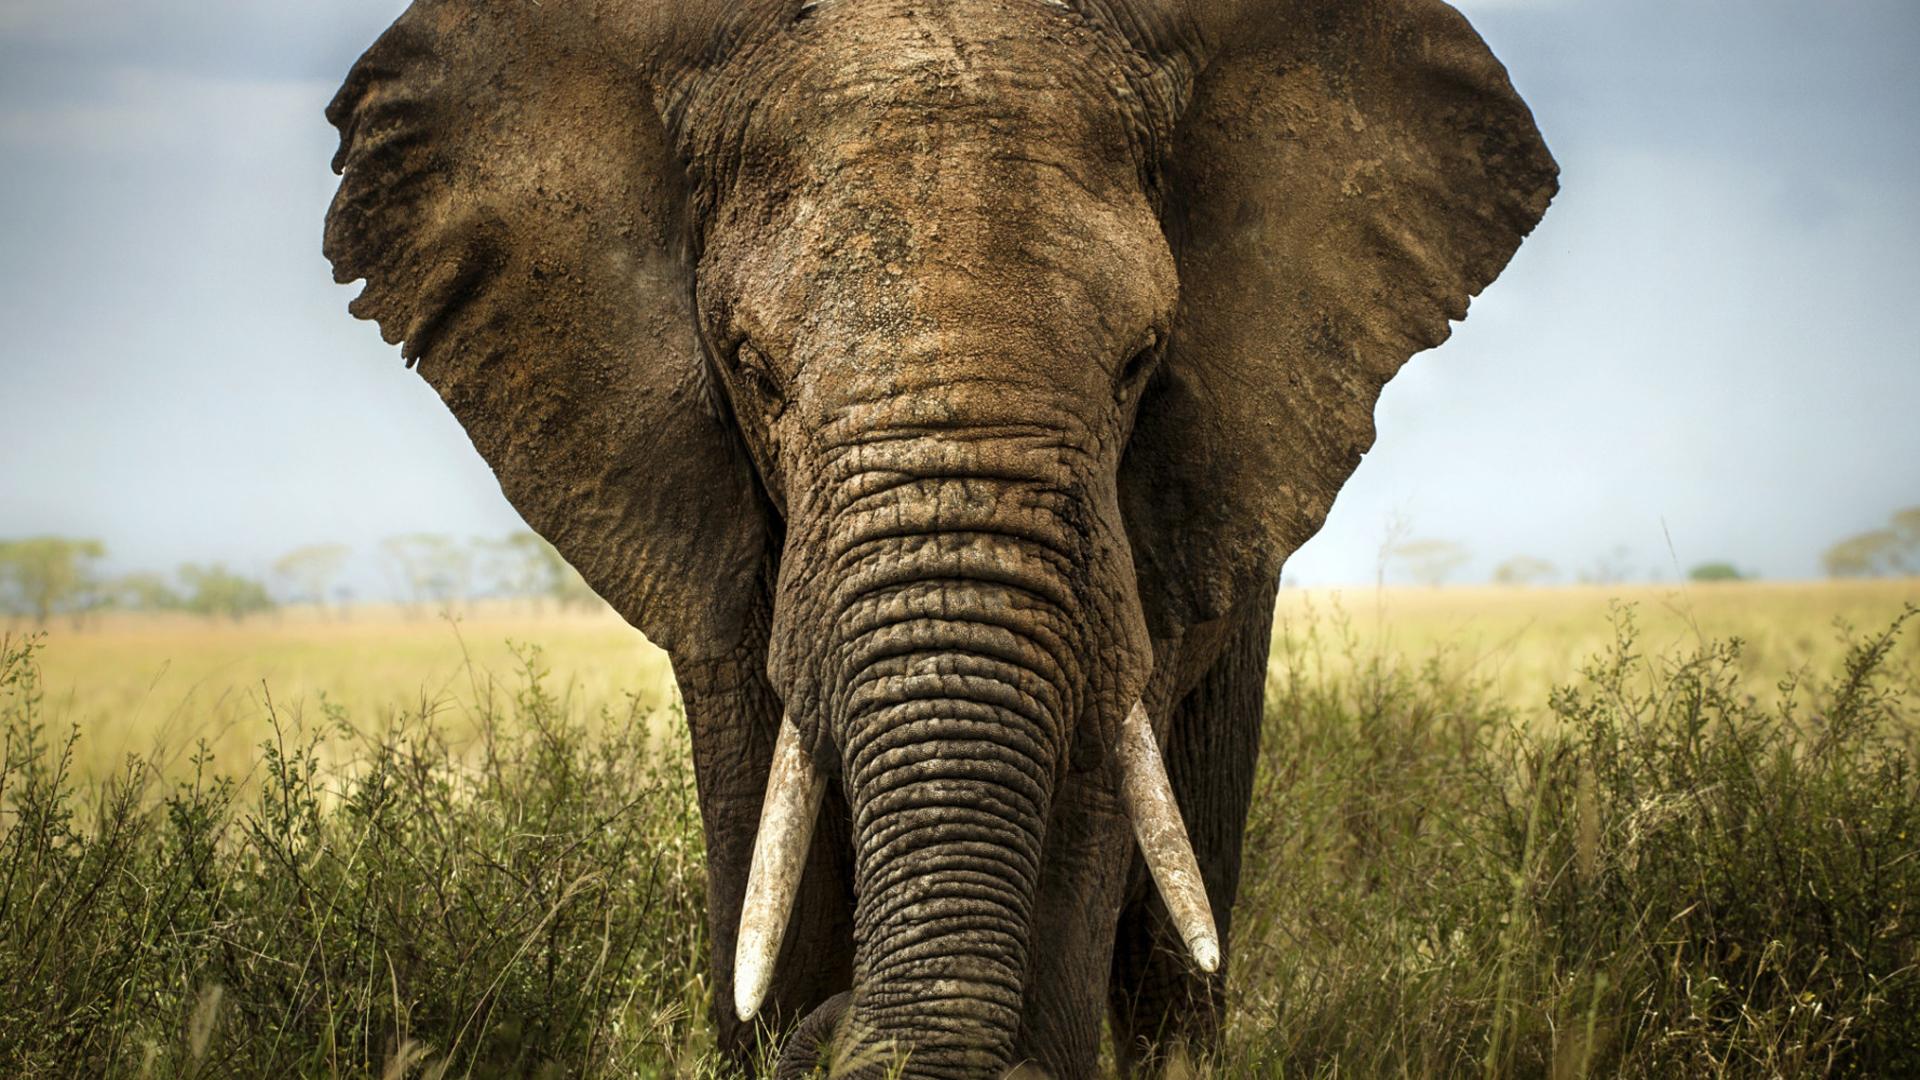 Elephant Wallpaper For Computer